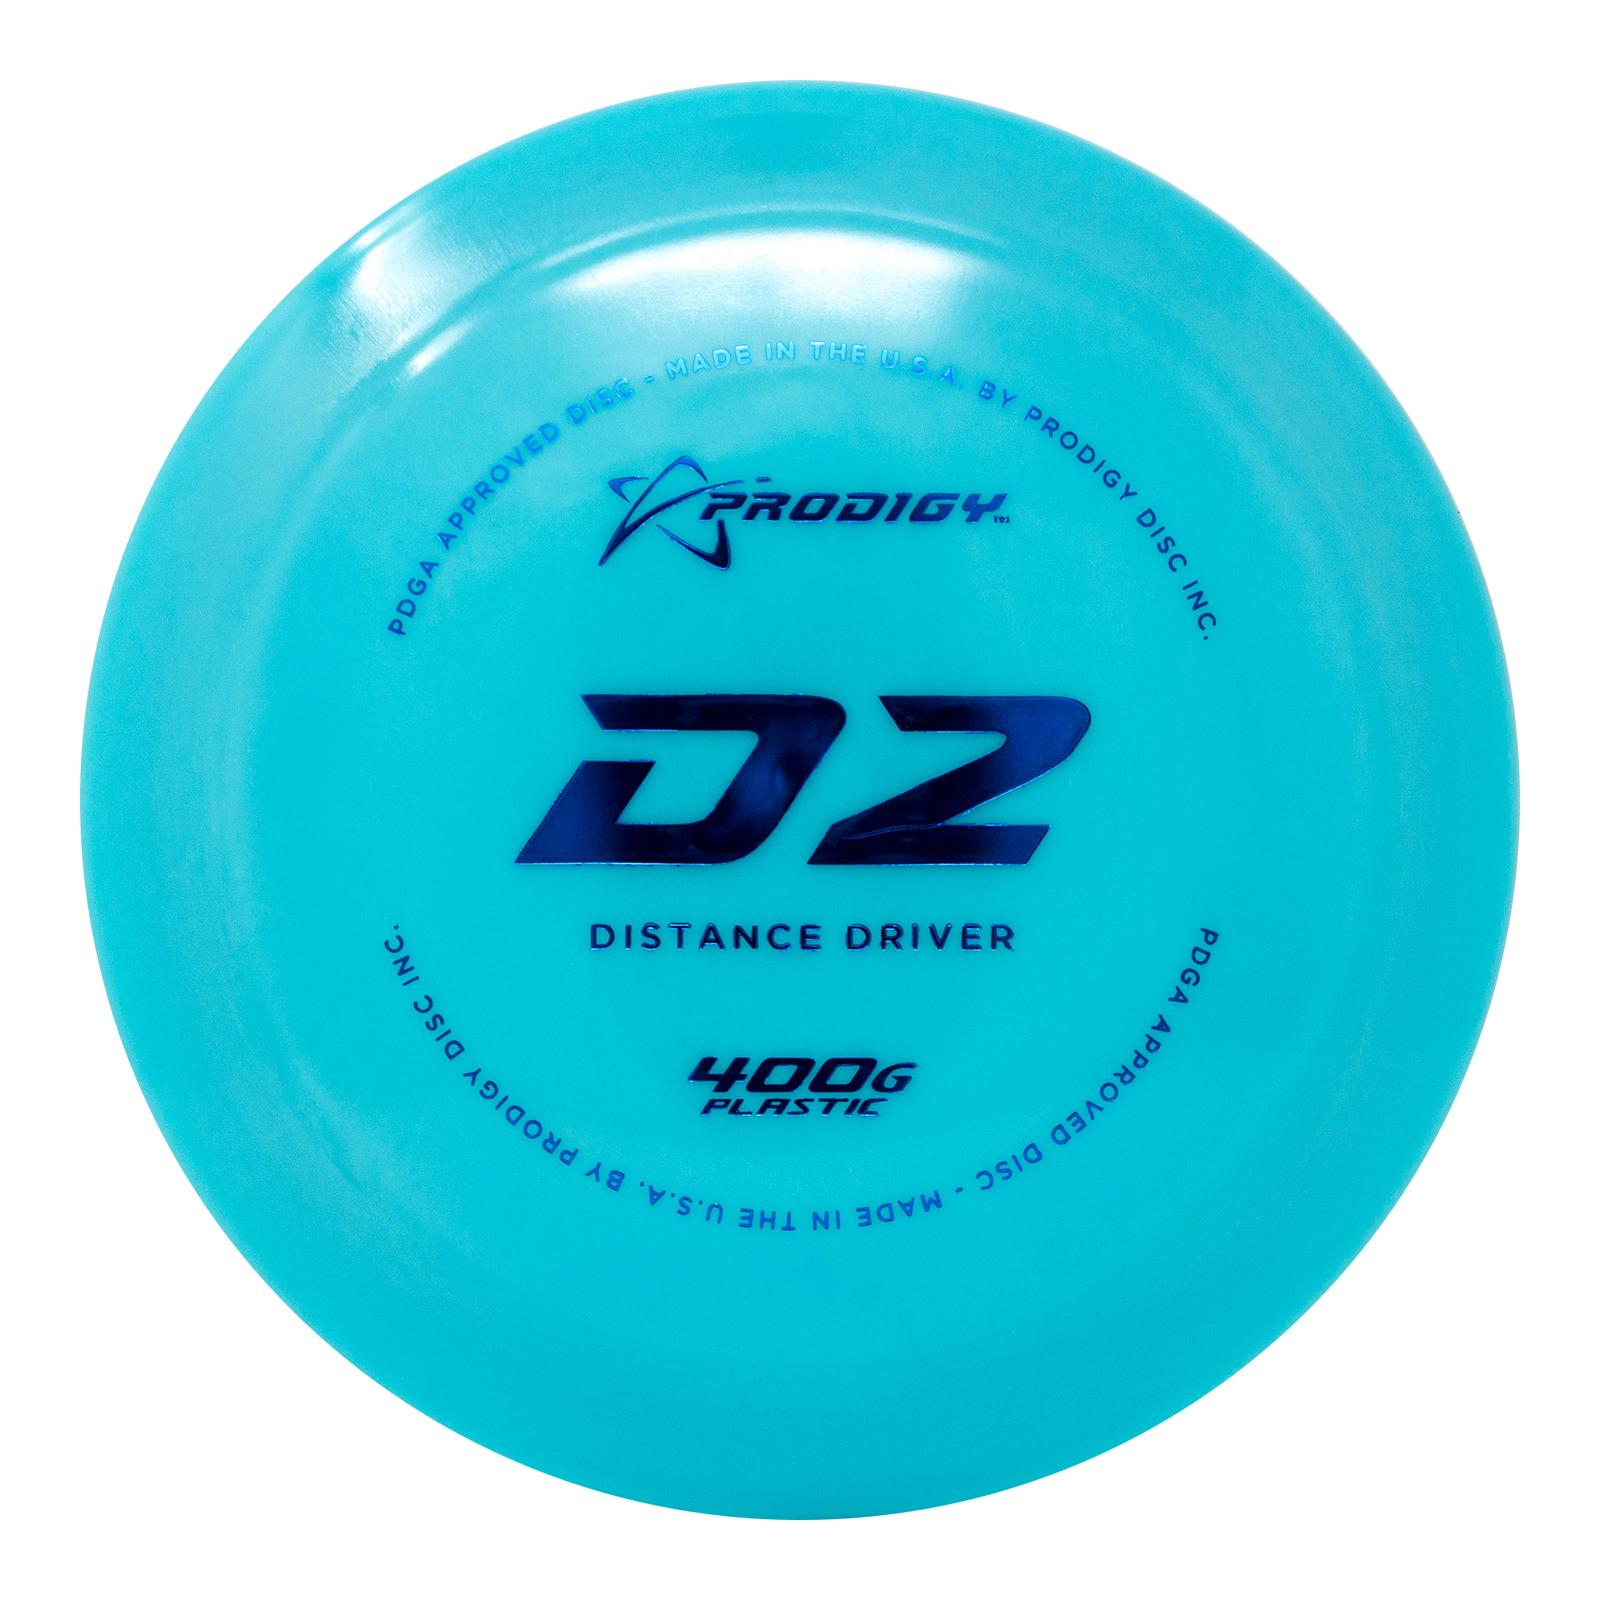 D2 - 400G PLASTIC